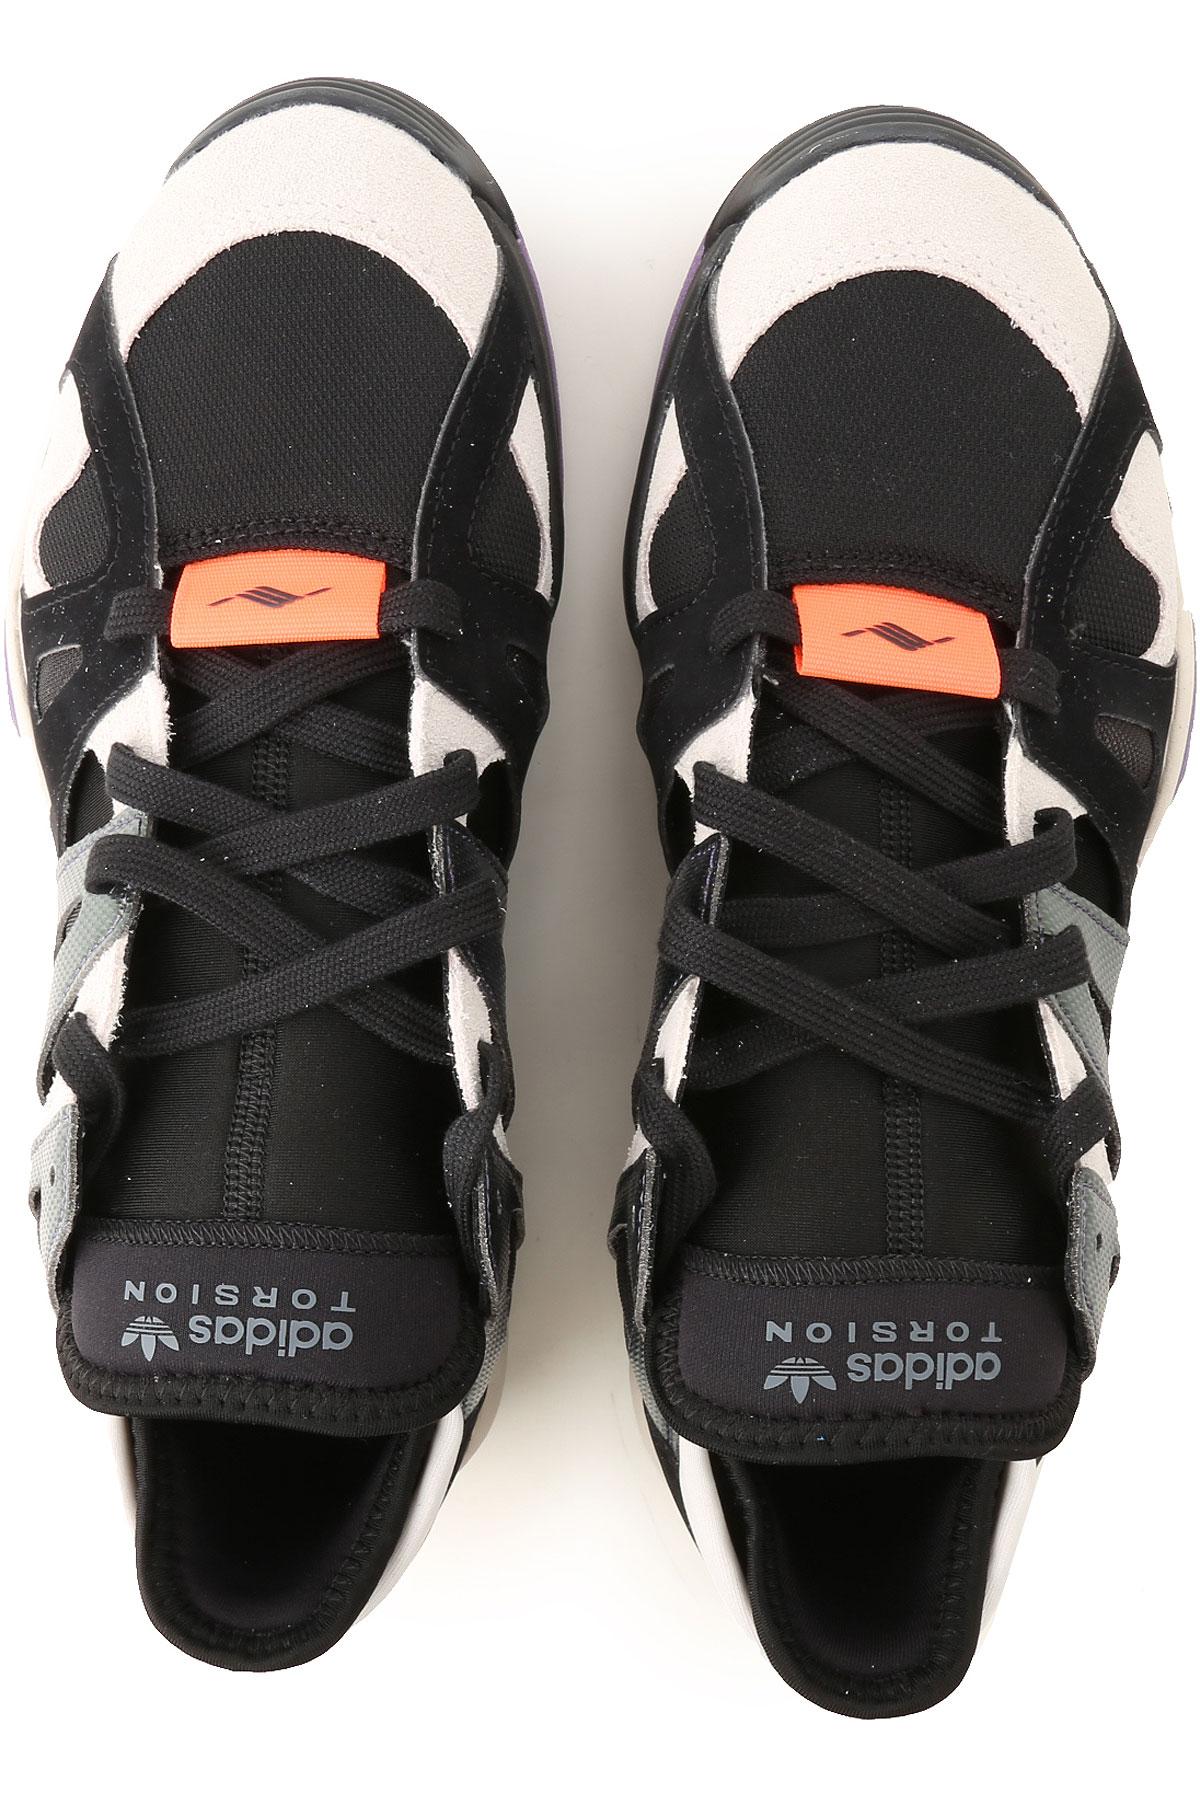 Negro nbsp;multicolor Hombres 2019 Para Primavera verano Púrpura Zapatos Adidas qx8nvPYpw